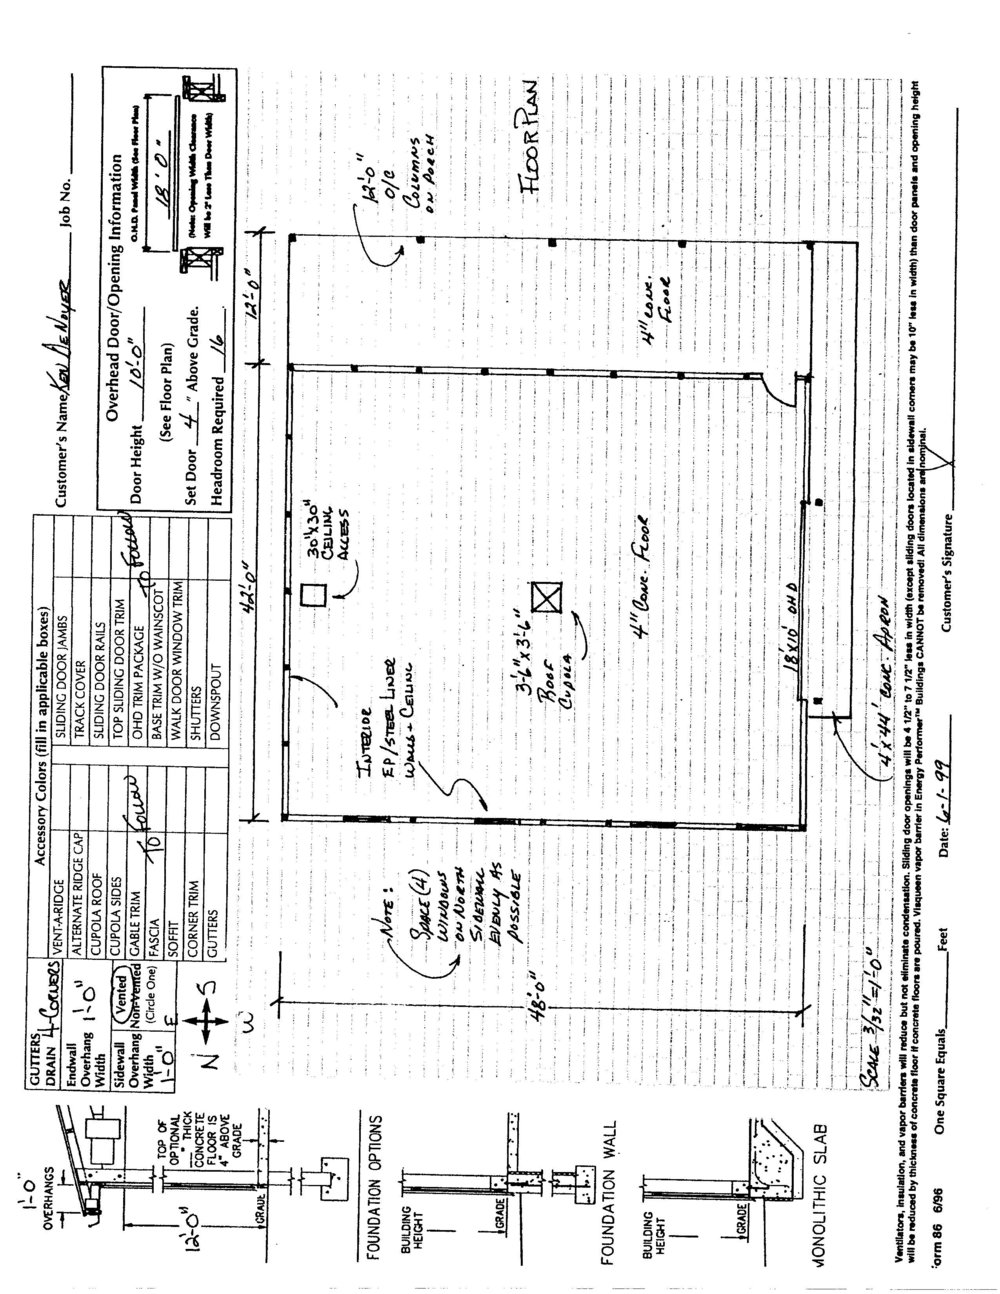 5544 E Kabat Road , Cedar - Marketing Packet for sale by Oltersdorf Realty LLC (23).jpg